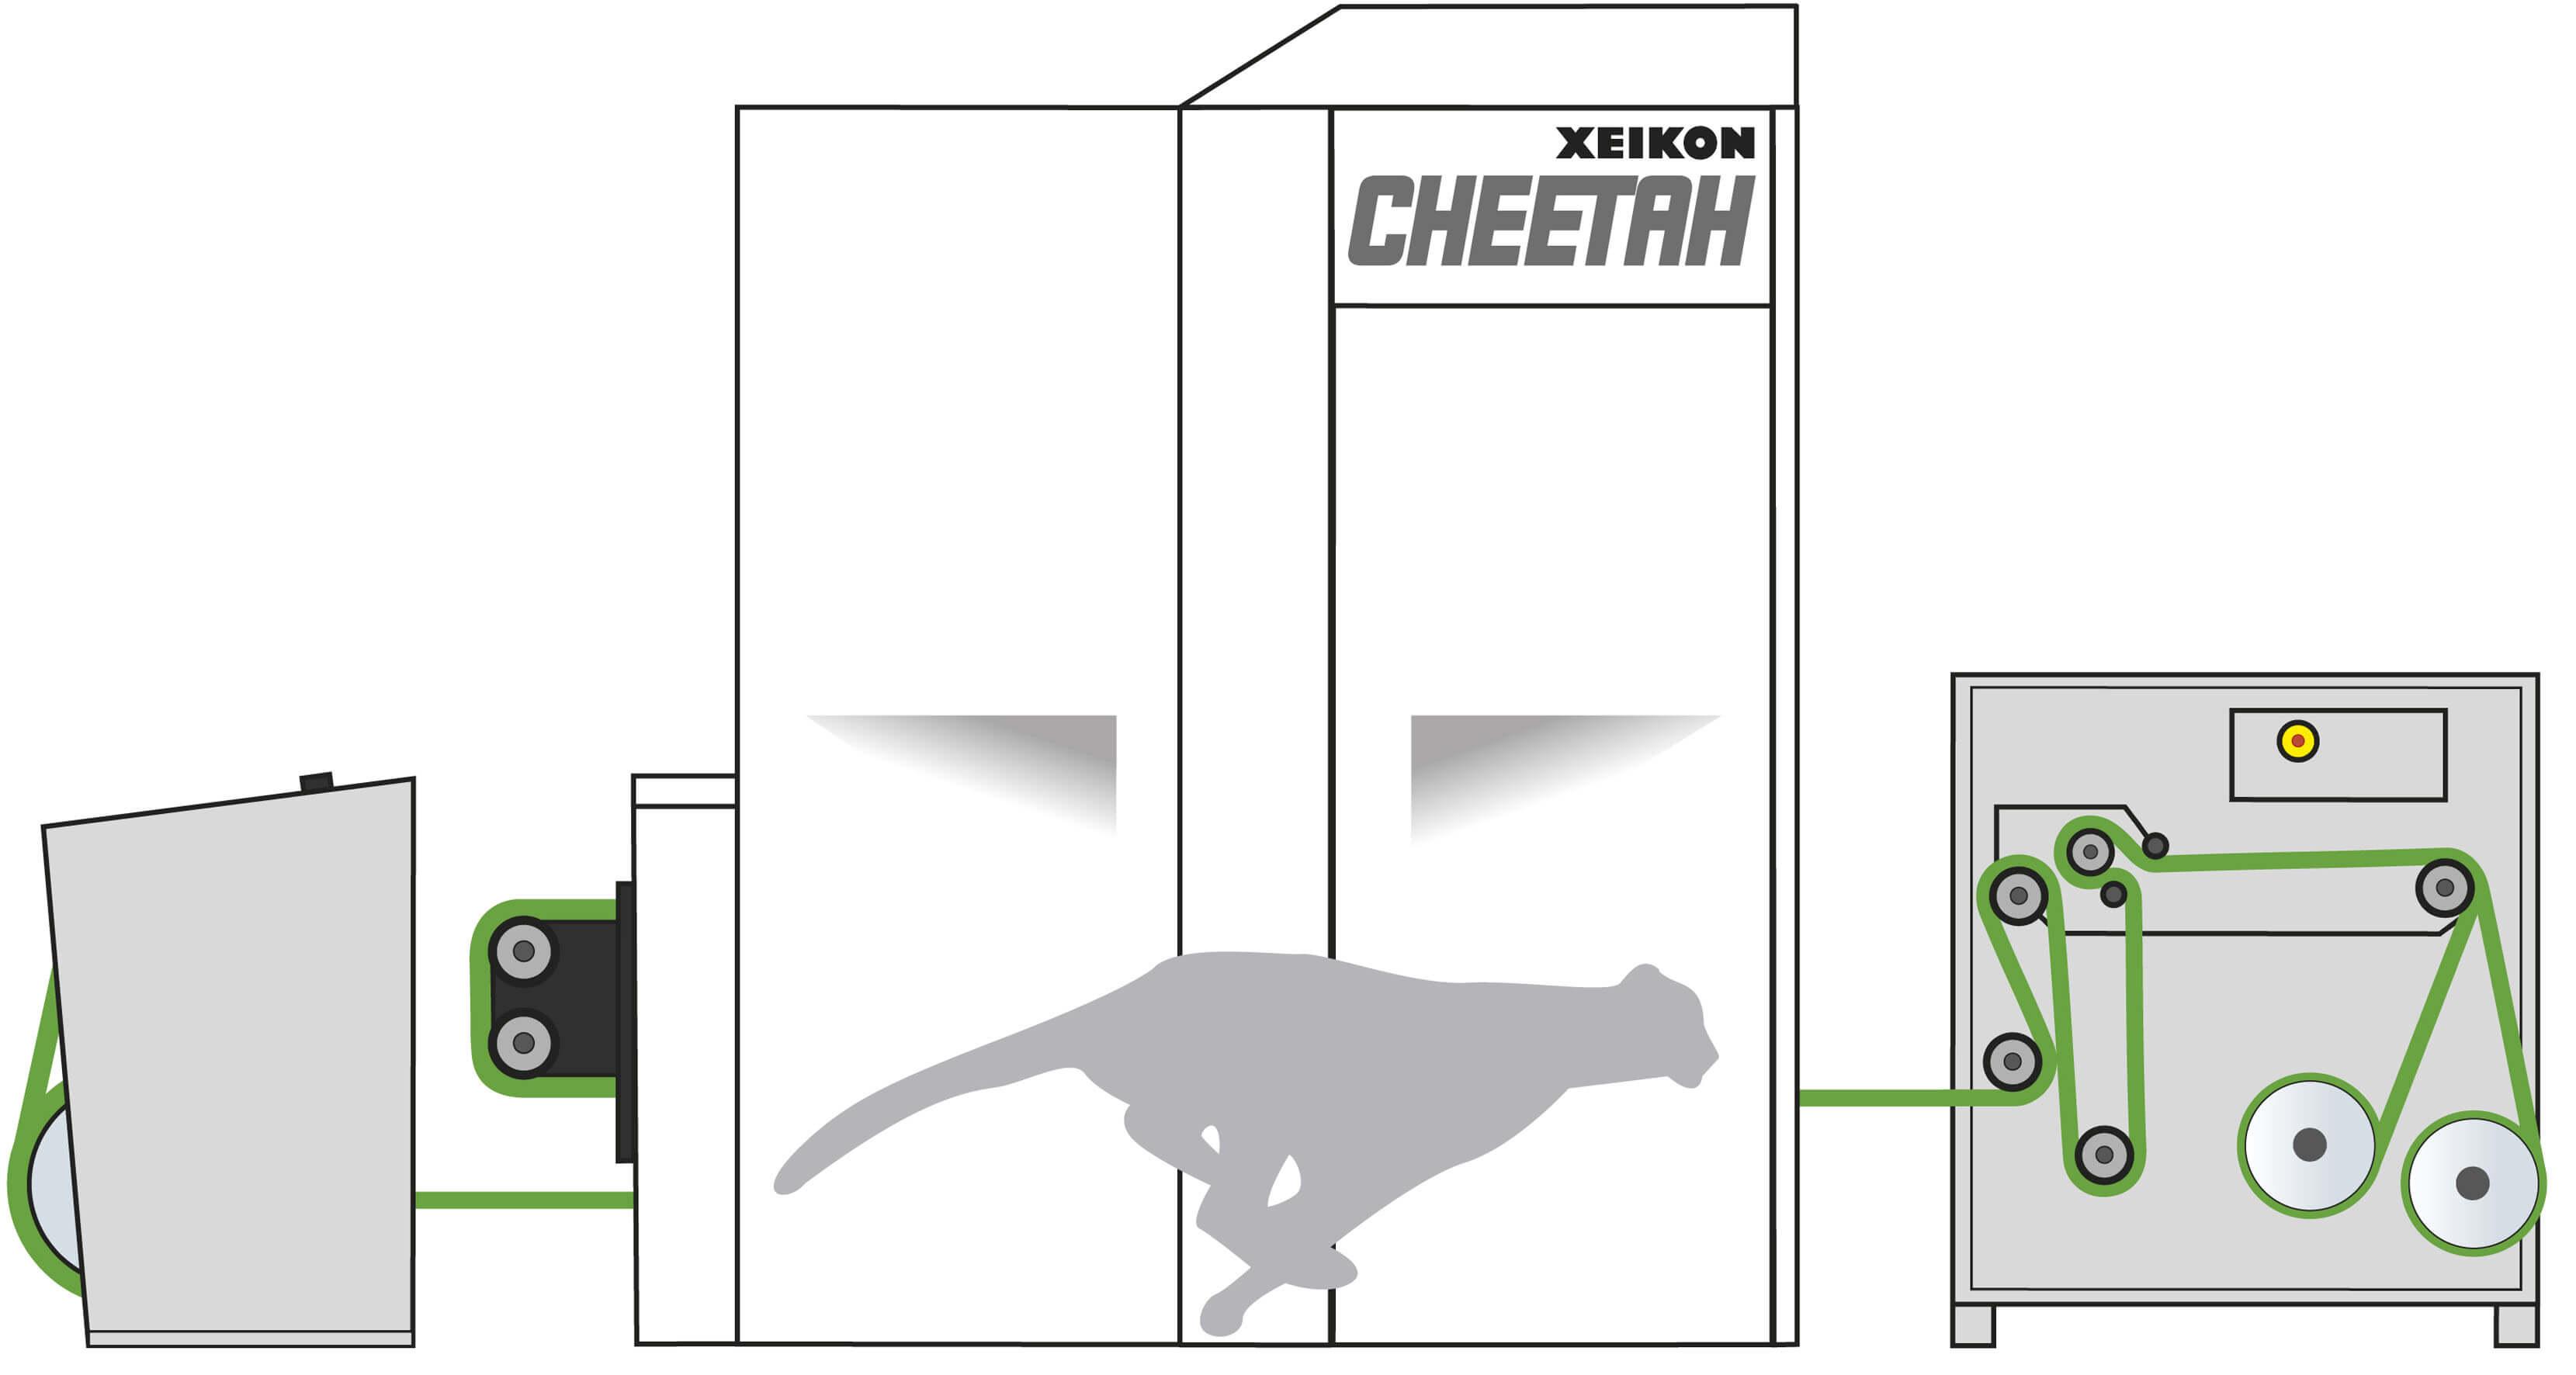 X2014_US_SpecSheets_Cheetah_v02.indd